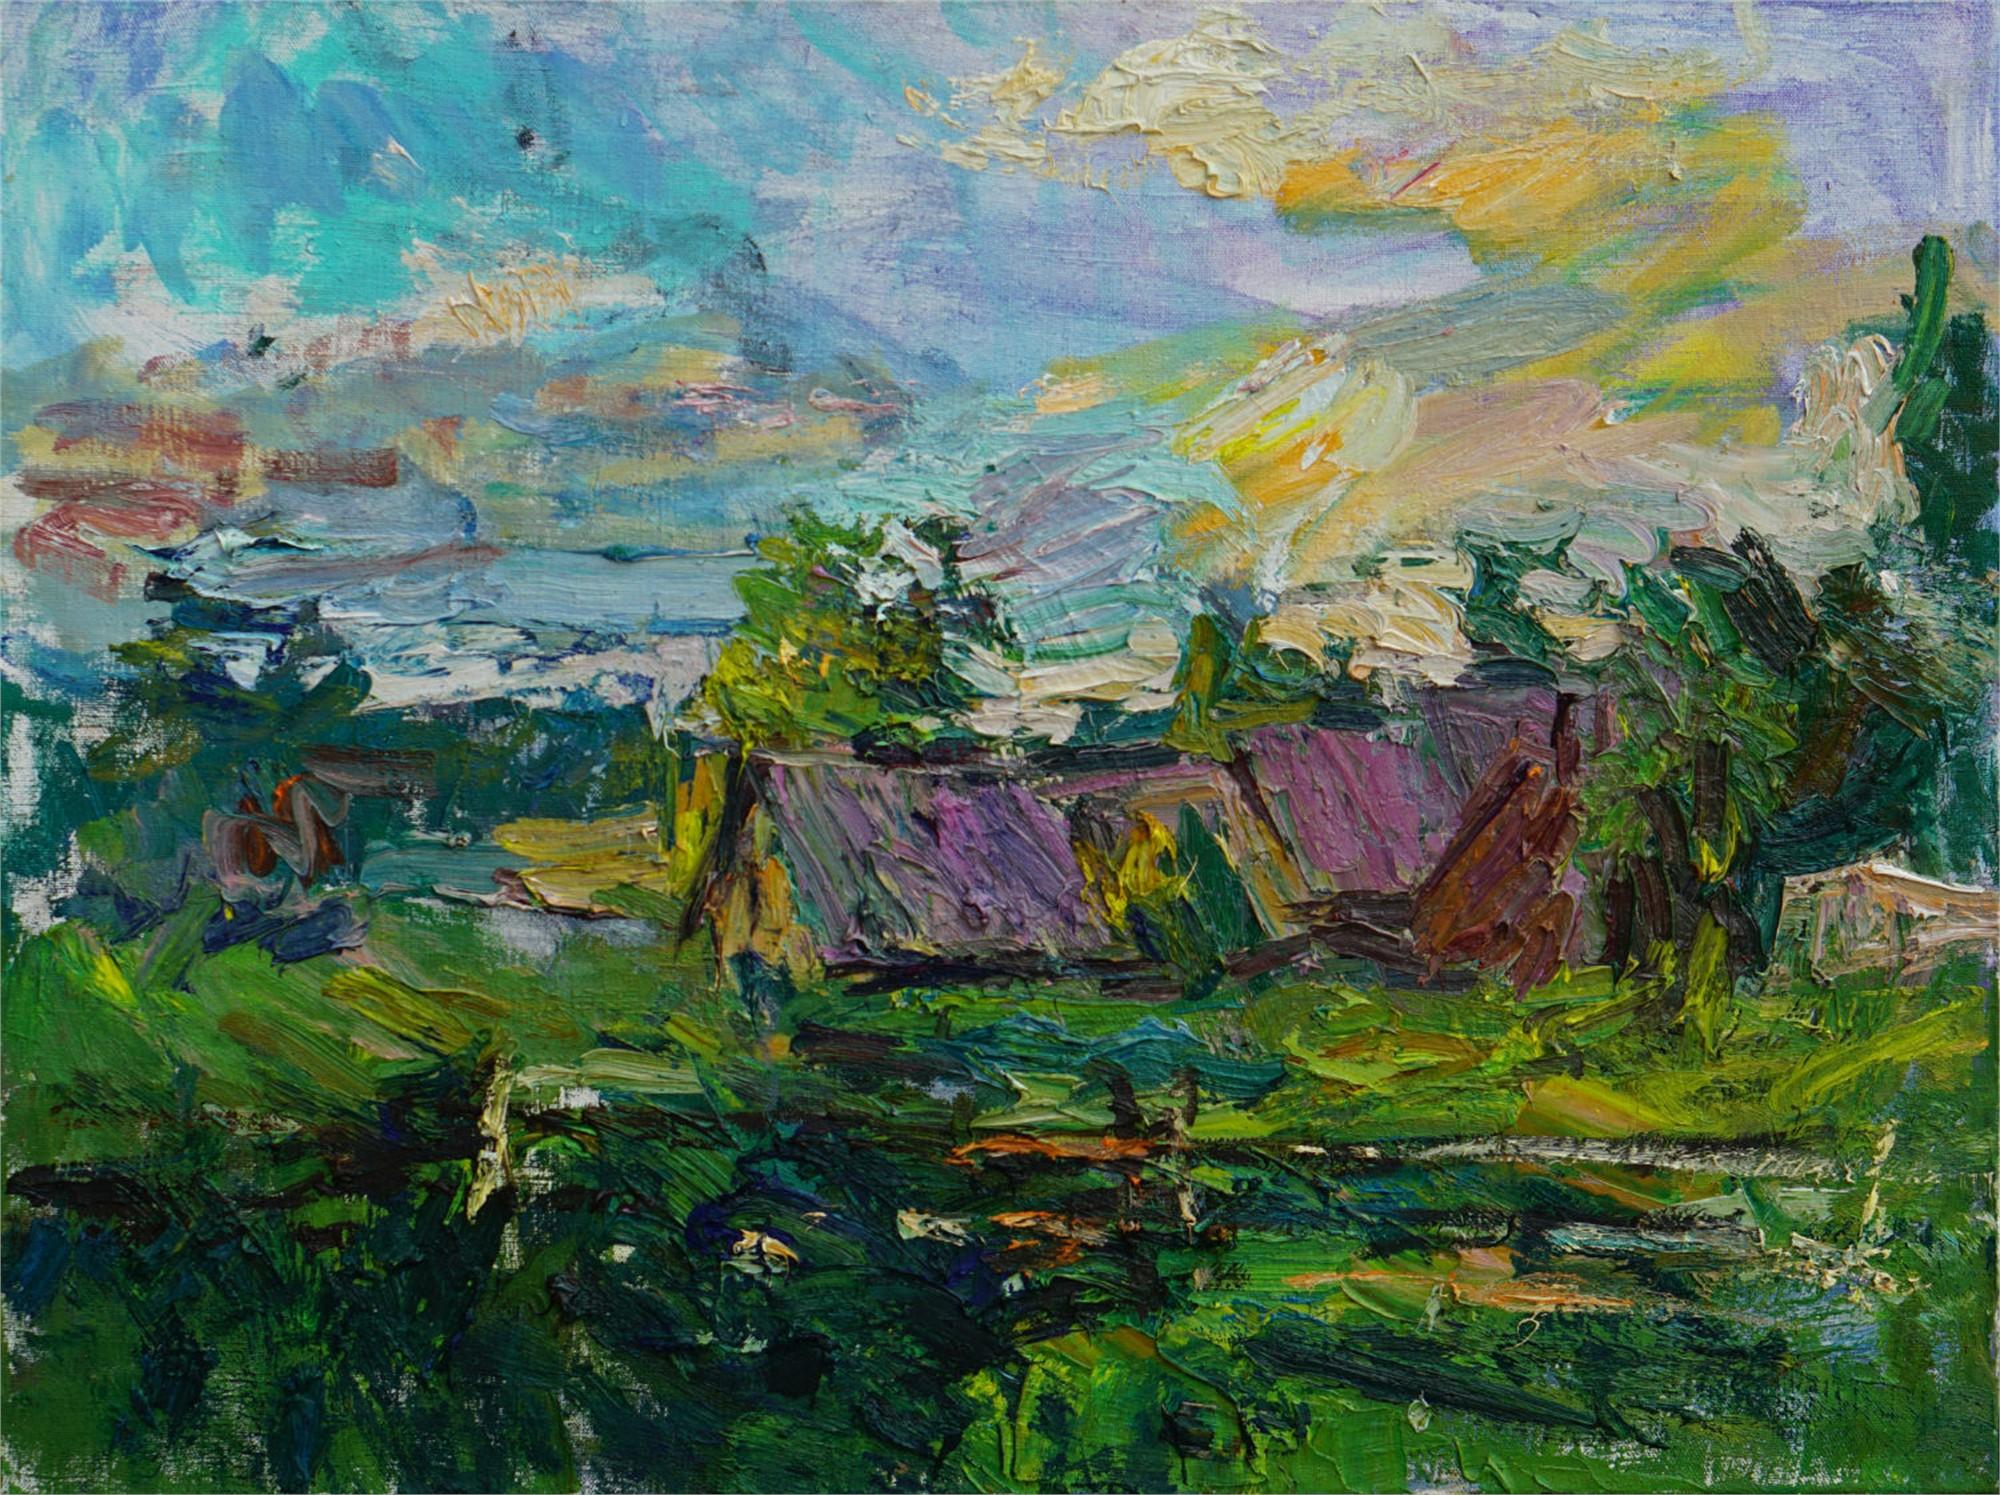 Towards Evening by Ulrich Gleiter